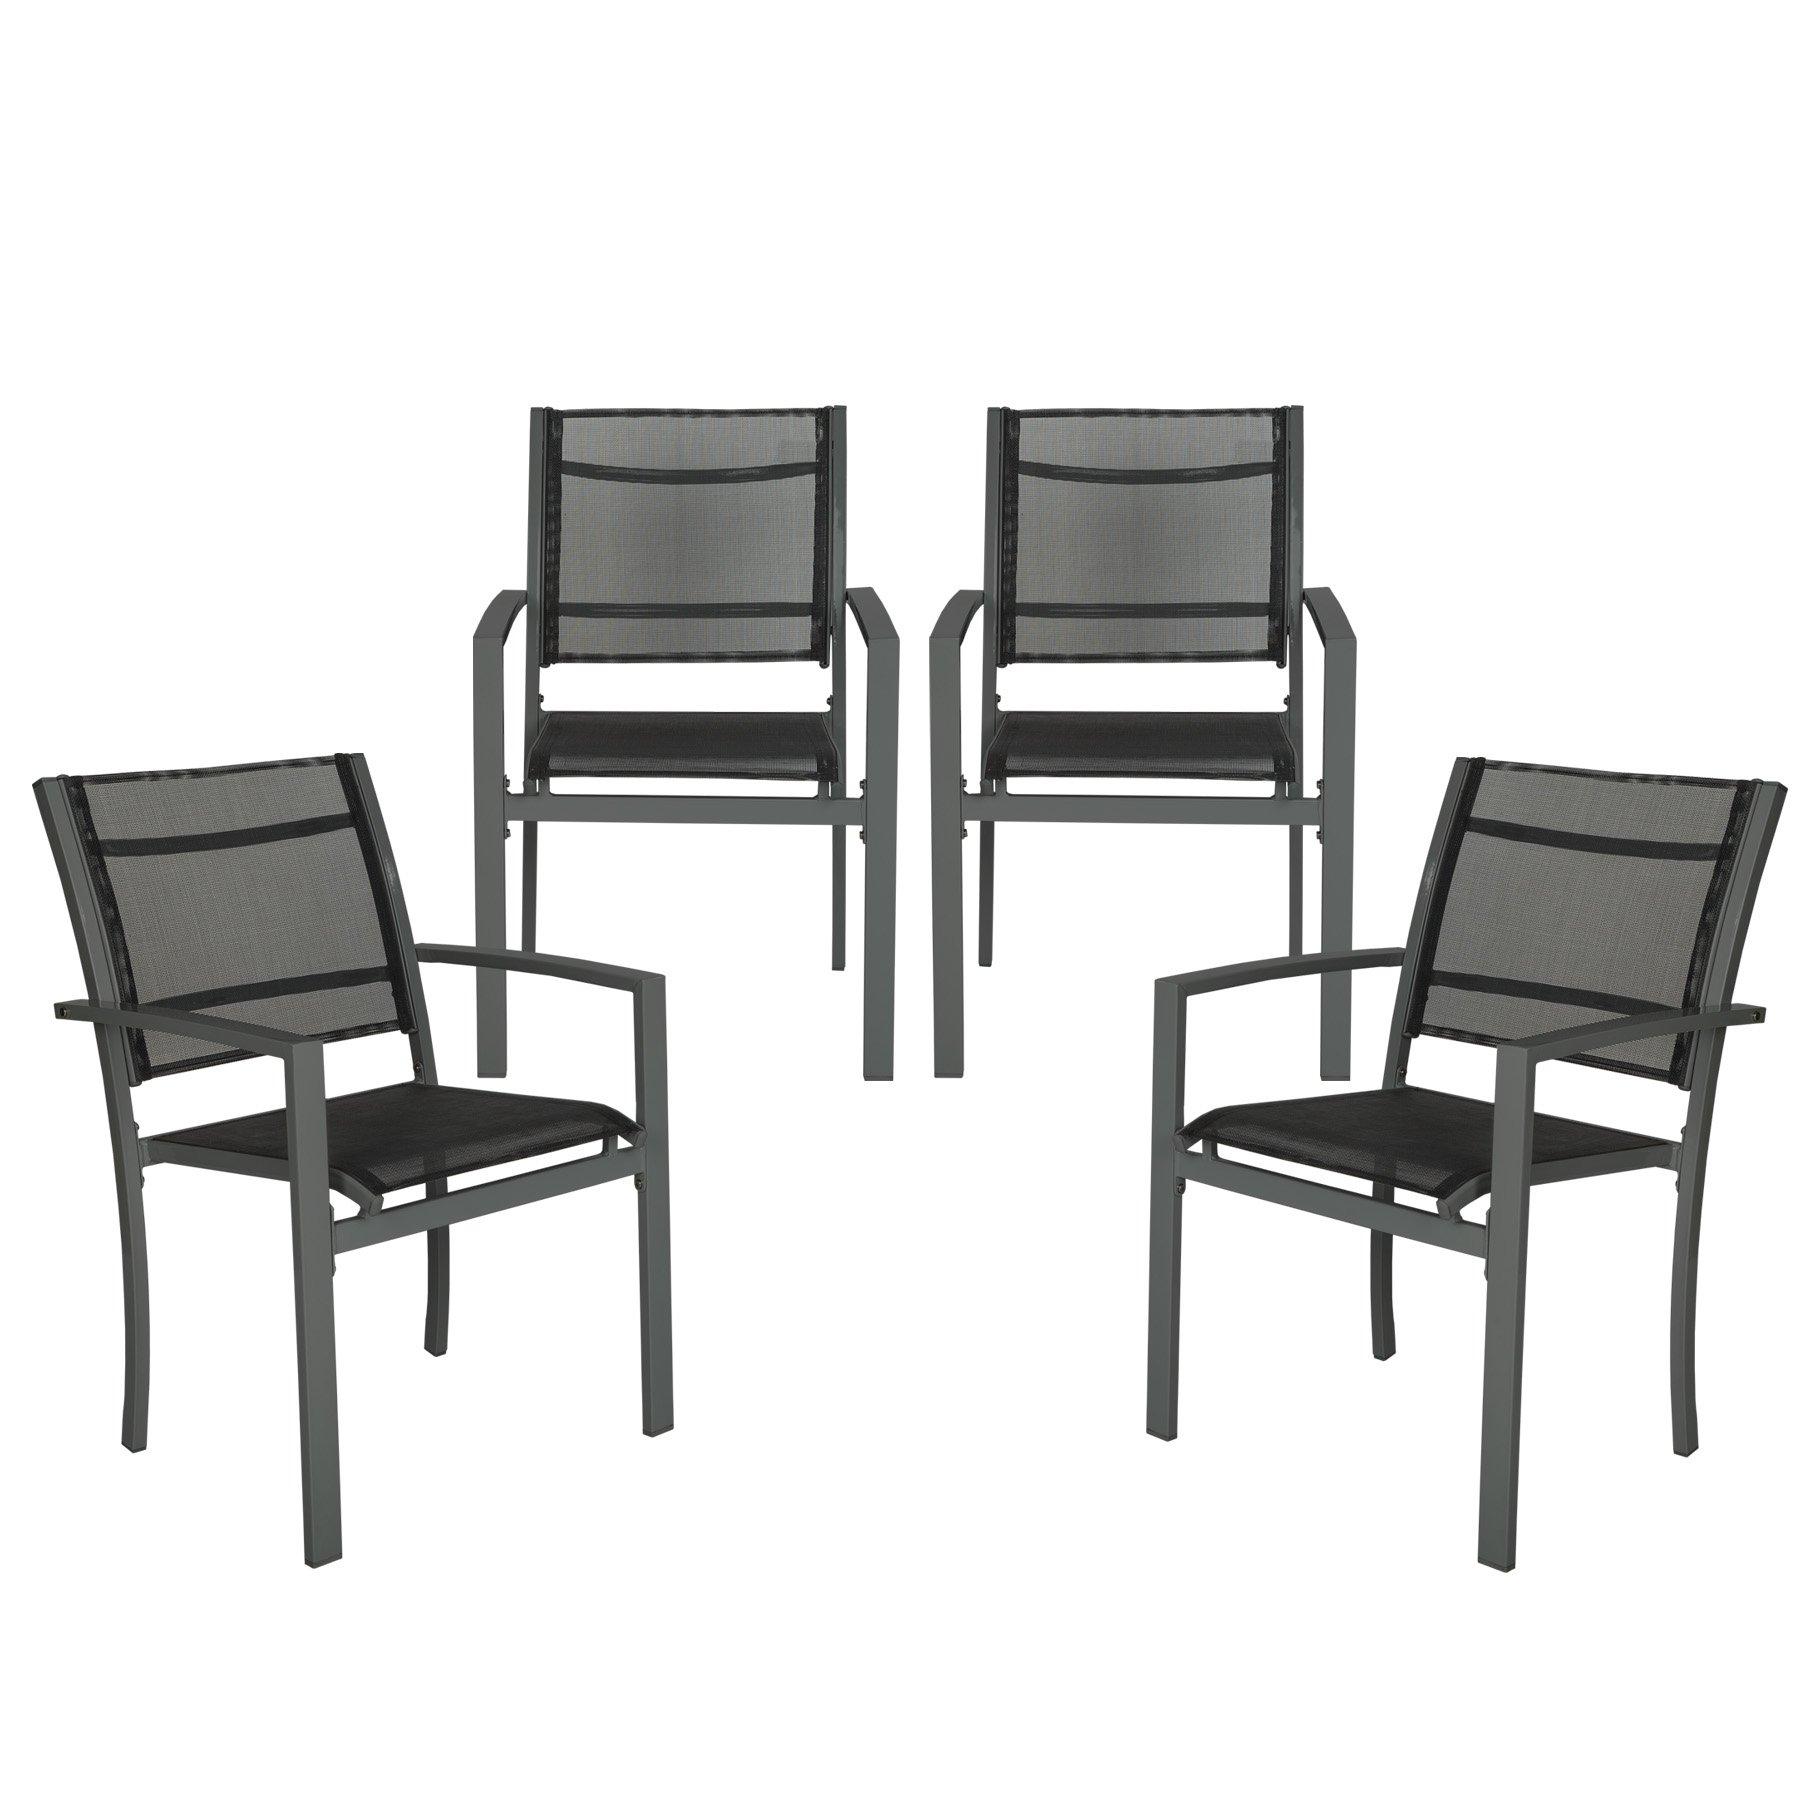 Set Di Sedie Da Giardino.Tectake Set Di 4 Sedie Da Giardino Poltrona Campeggio Metallo